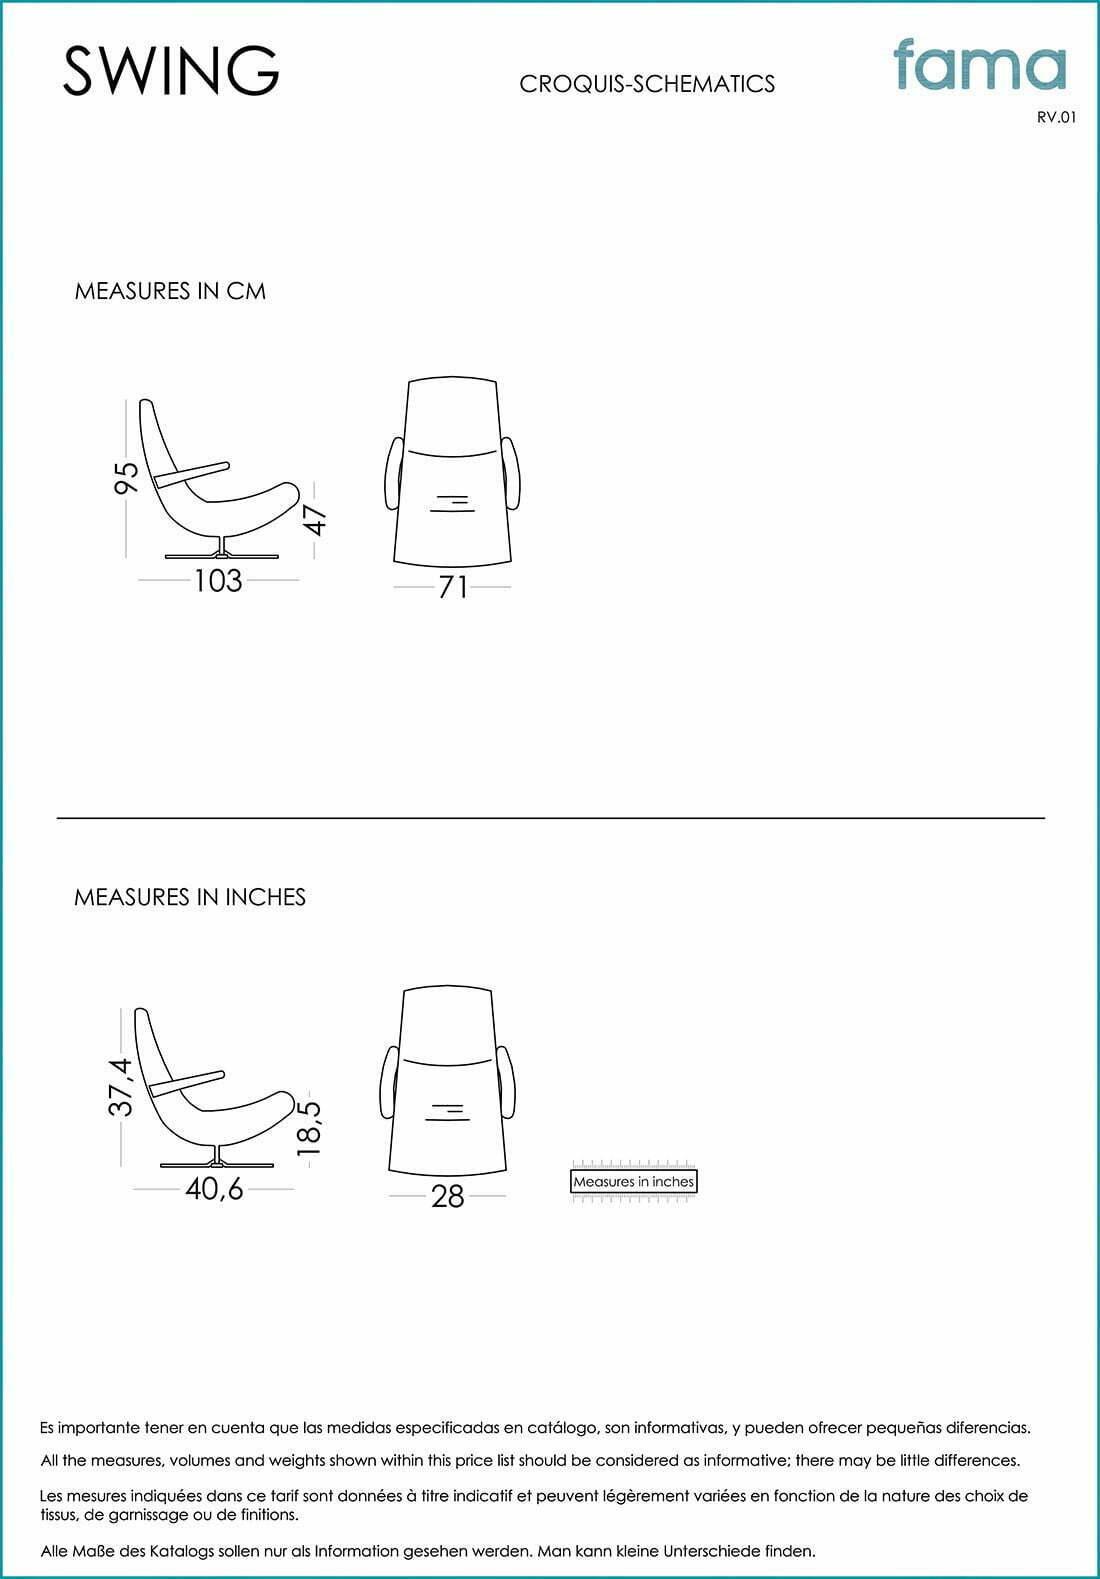 fauteuil-funky-base-pivotante-famaliving-montreal-swing-fiche-technique